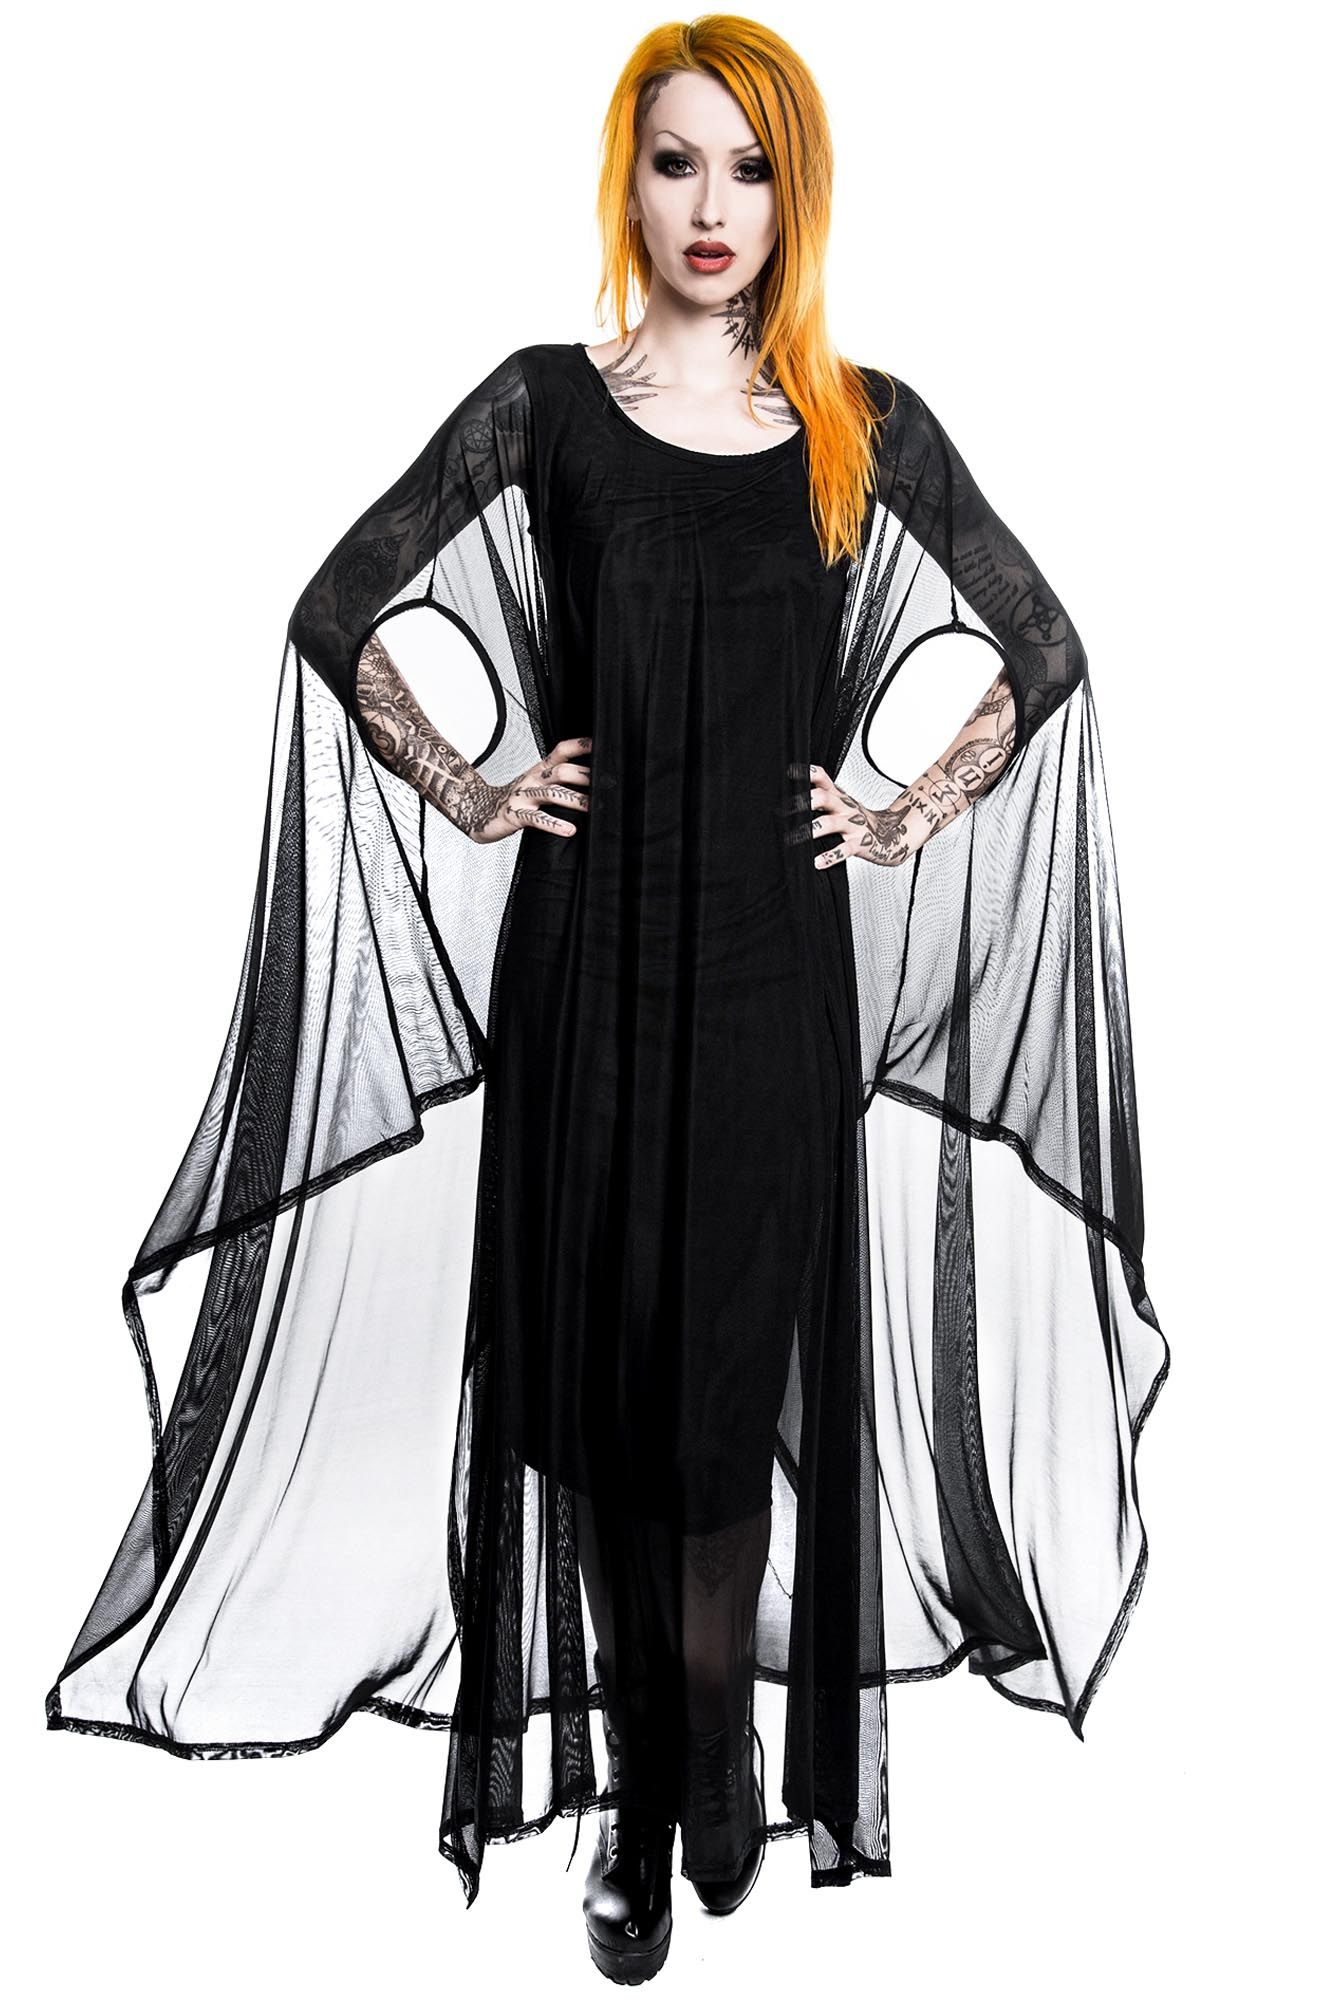 Mystic Hannah Hell Mesh Maxi Dress 'killstar, #gothdress, #goth, #witchy, #gothclothing